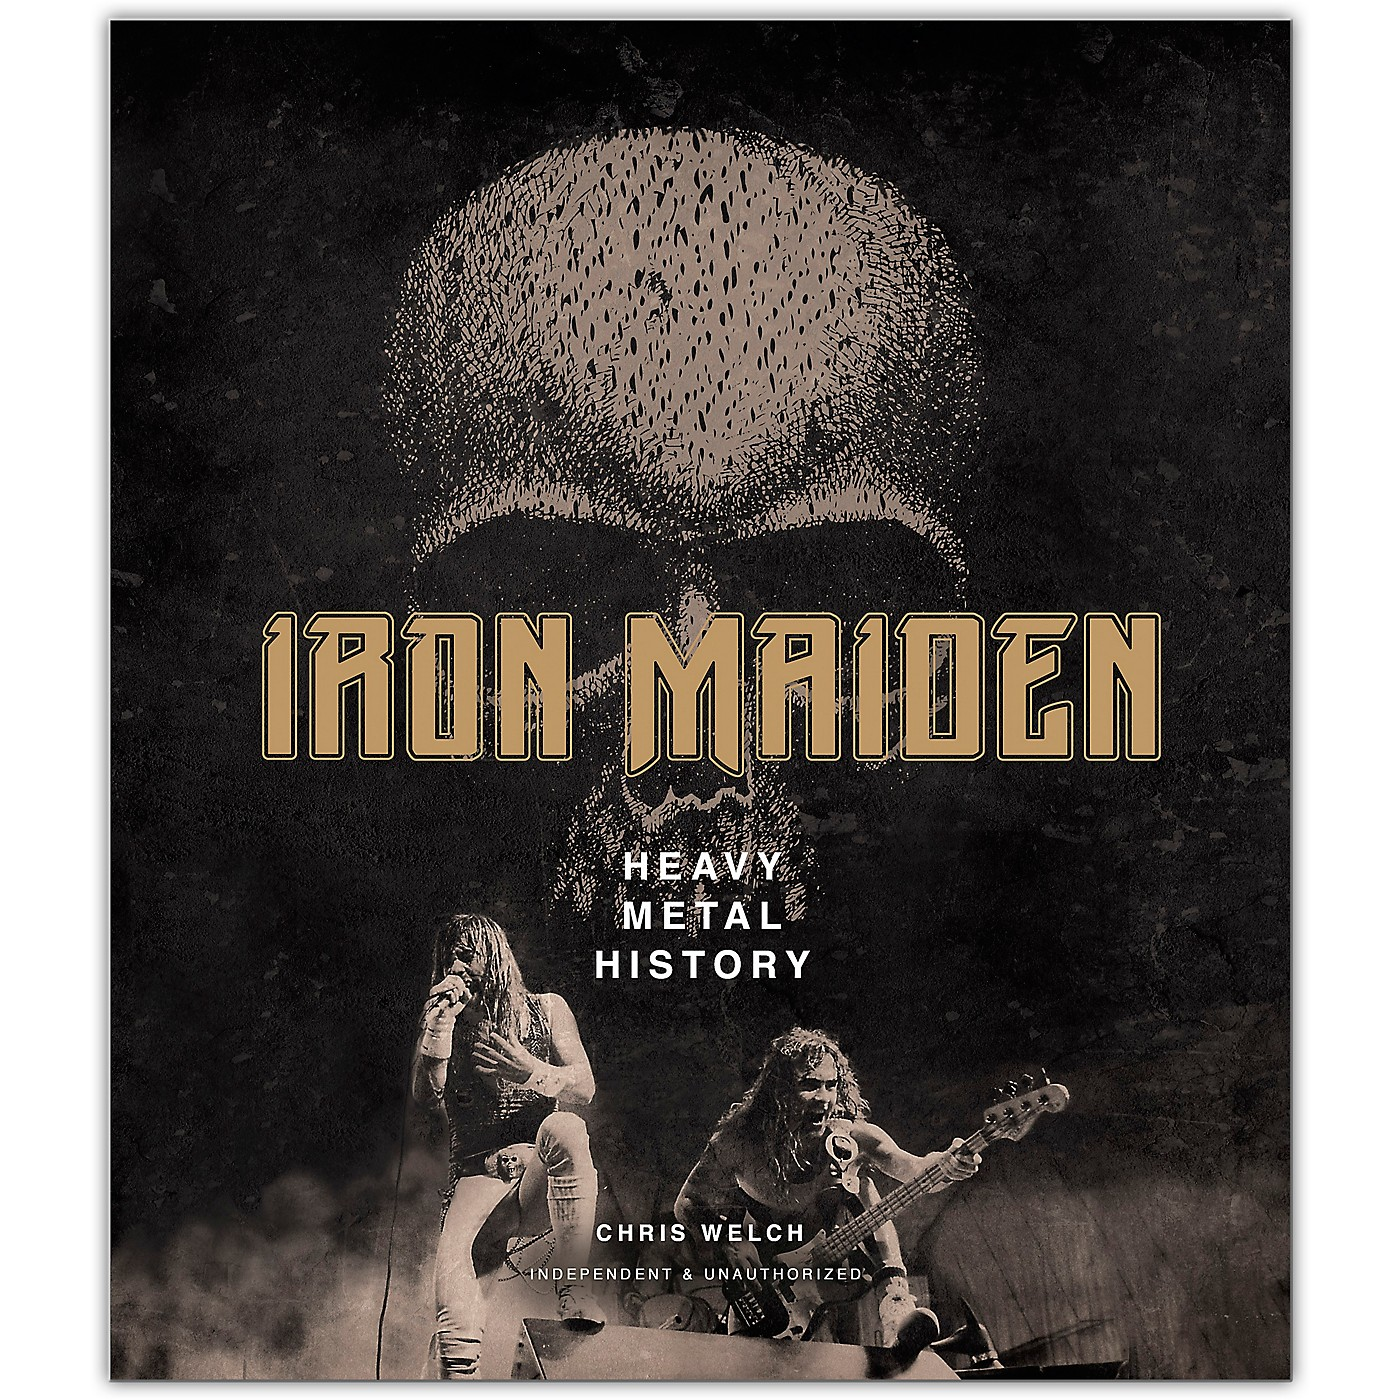 Hal Leonard Iron Maiden: Heavy Metal History - Hardcover Edition thumbnail